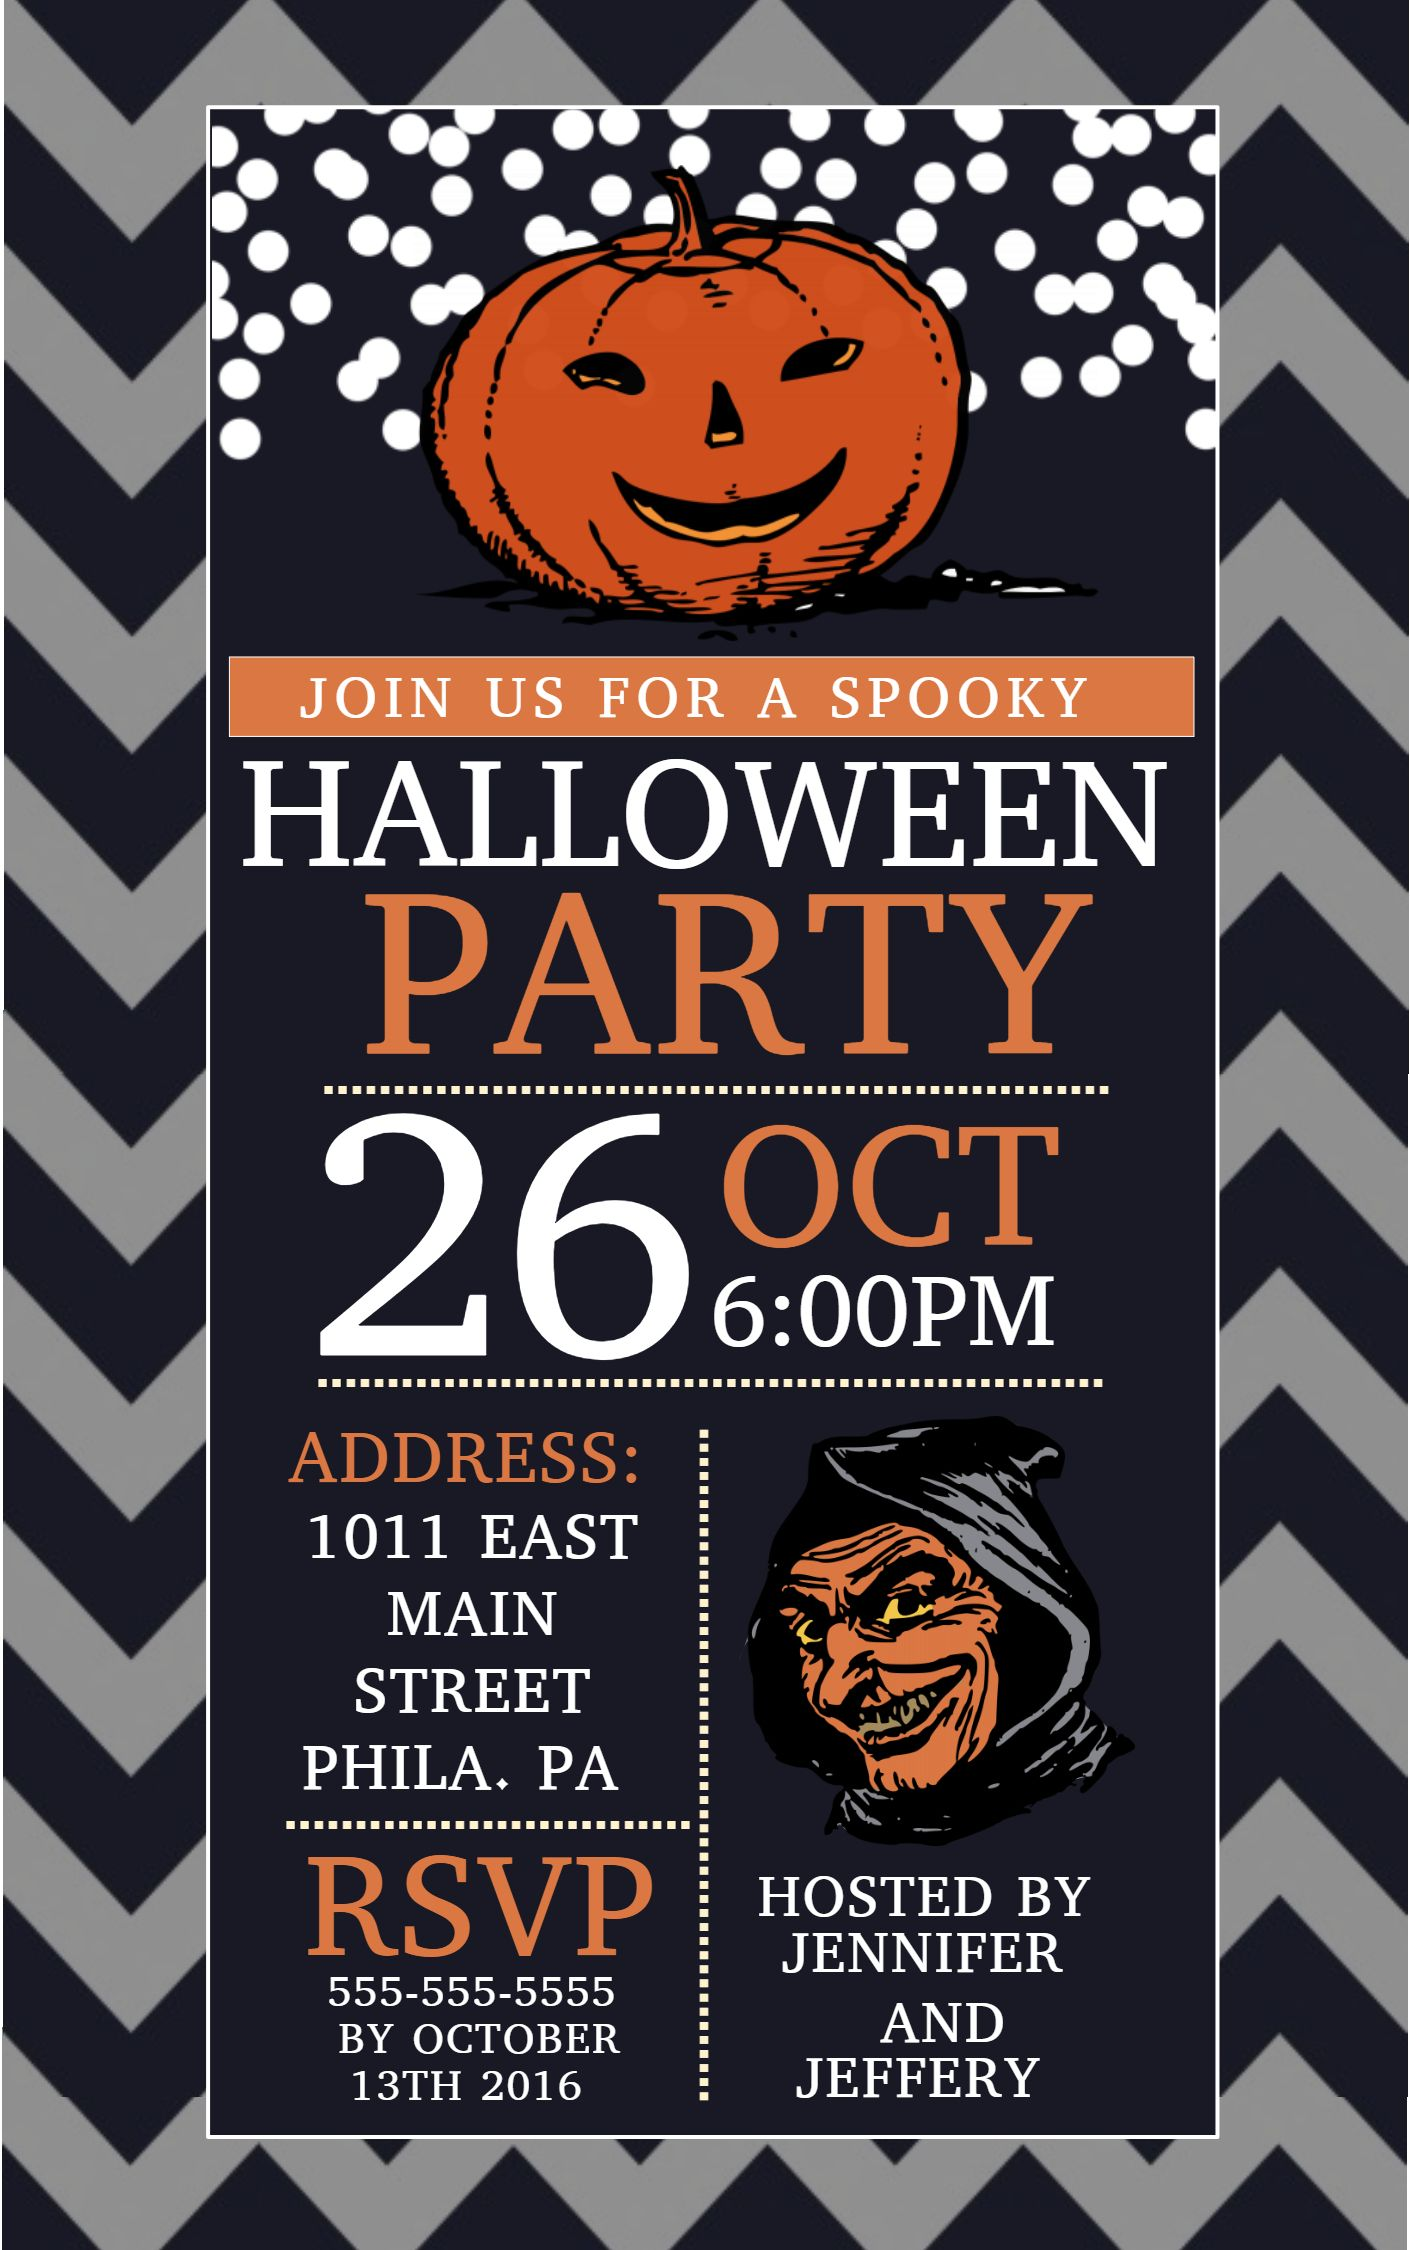 Halloween party flyer social media template. Halloween